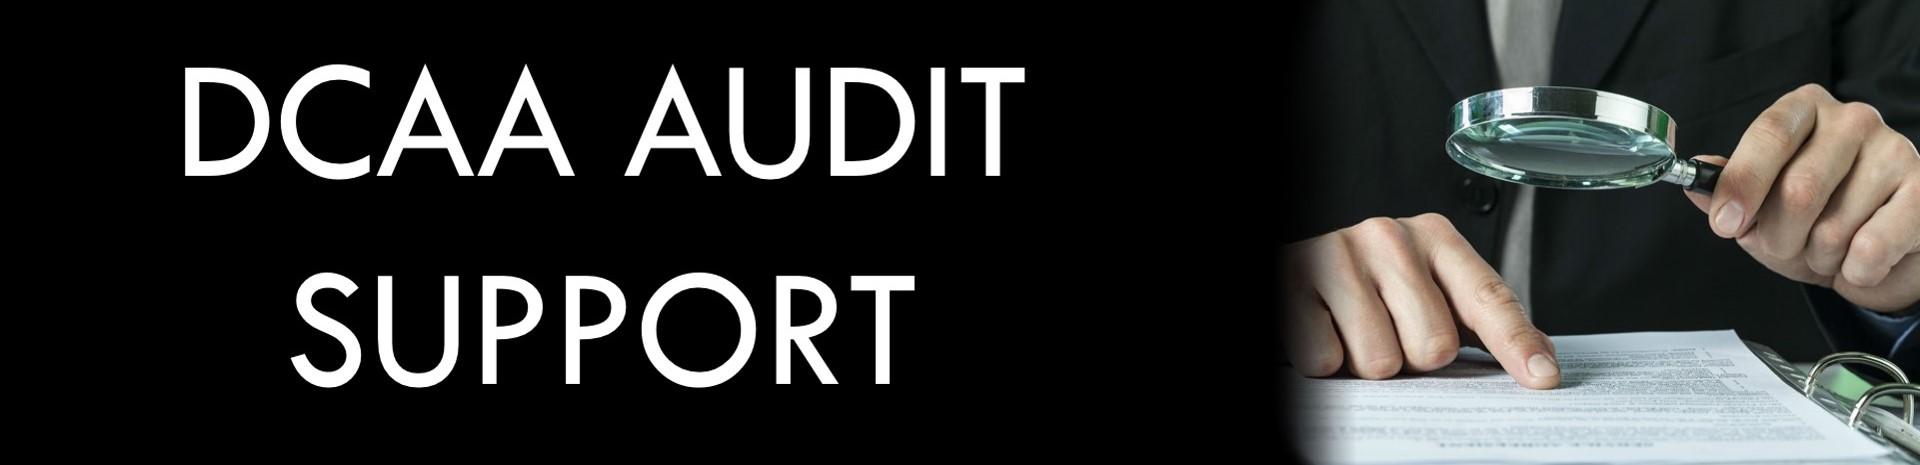 DCAA Audit